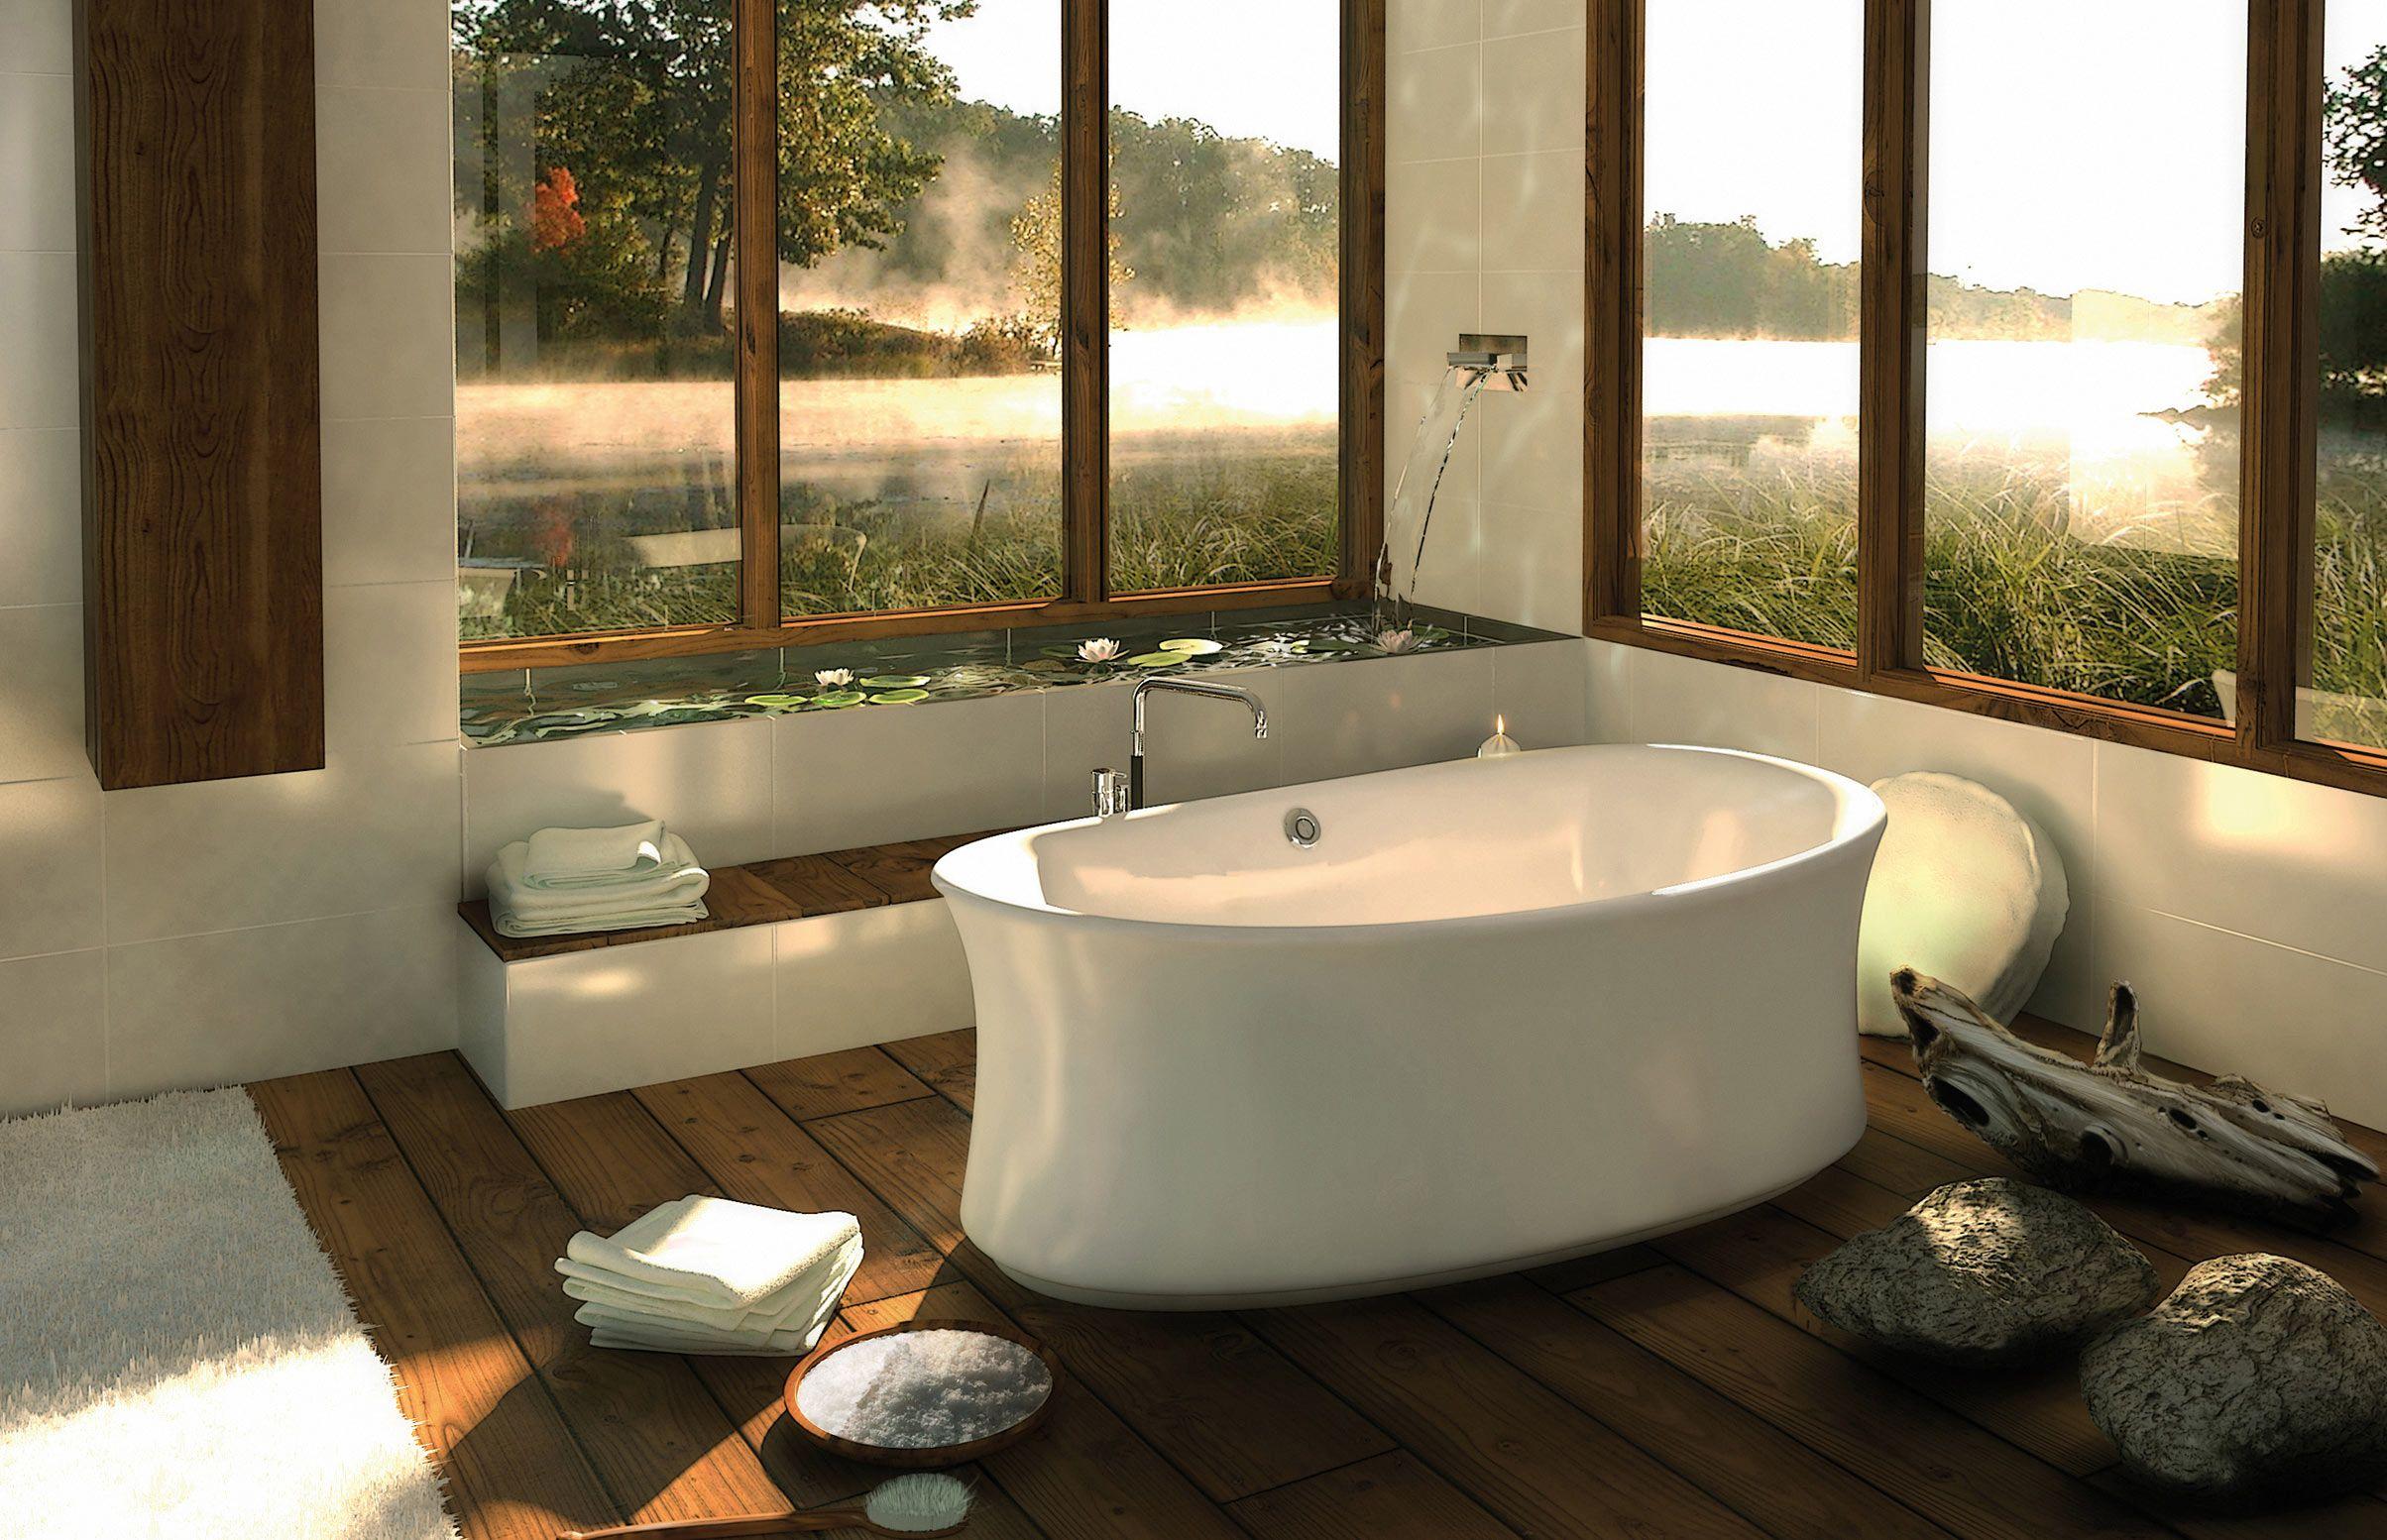 AMBROSIA F Freestanding bathtub - MAAX Collection   Bathroom Designs ...